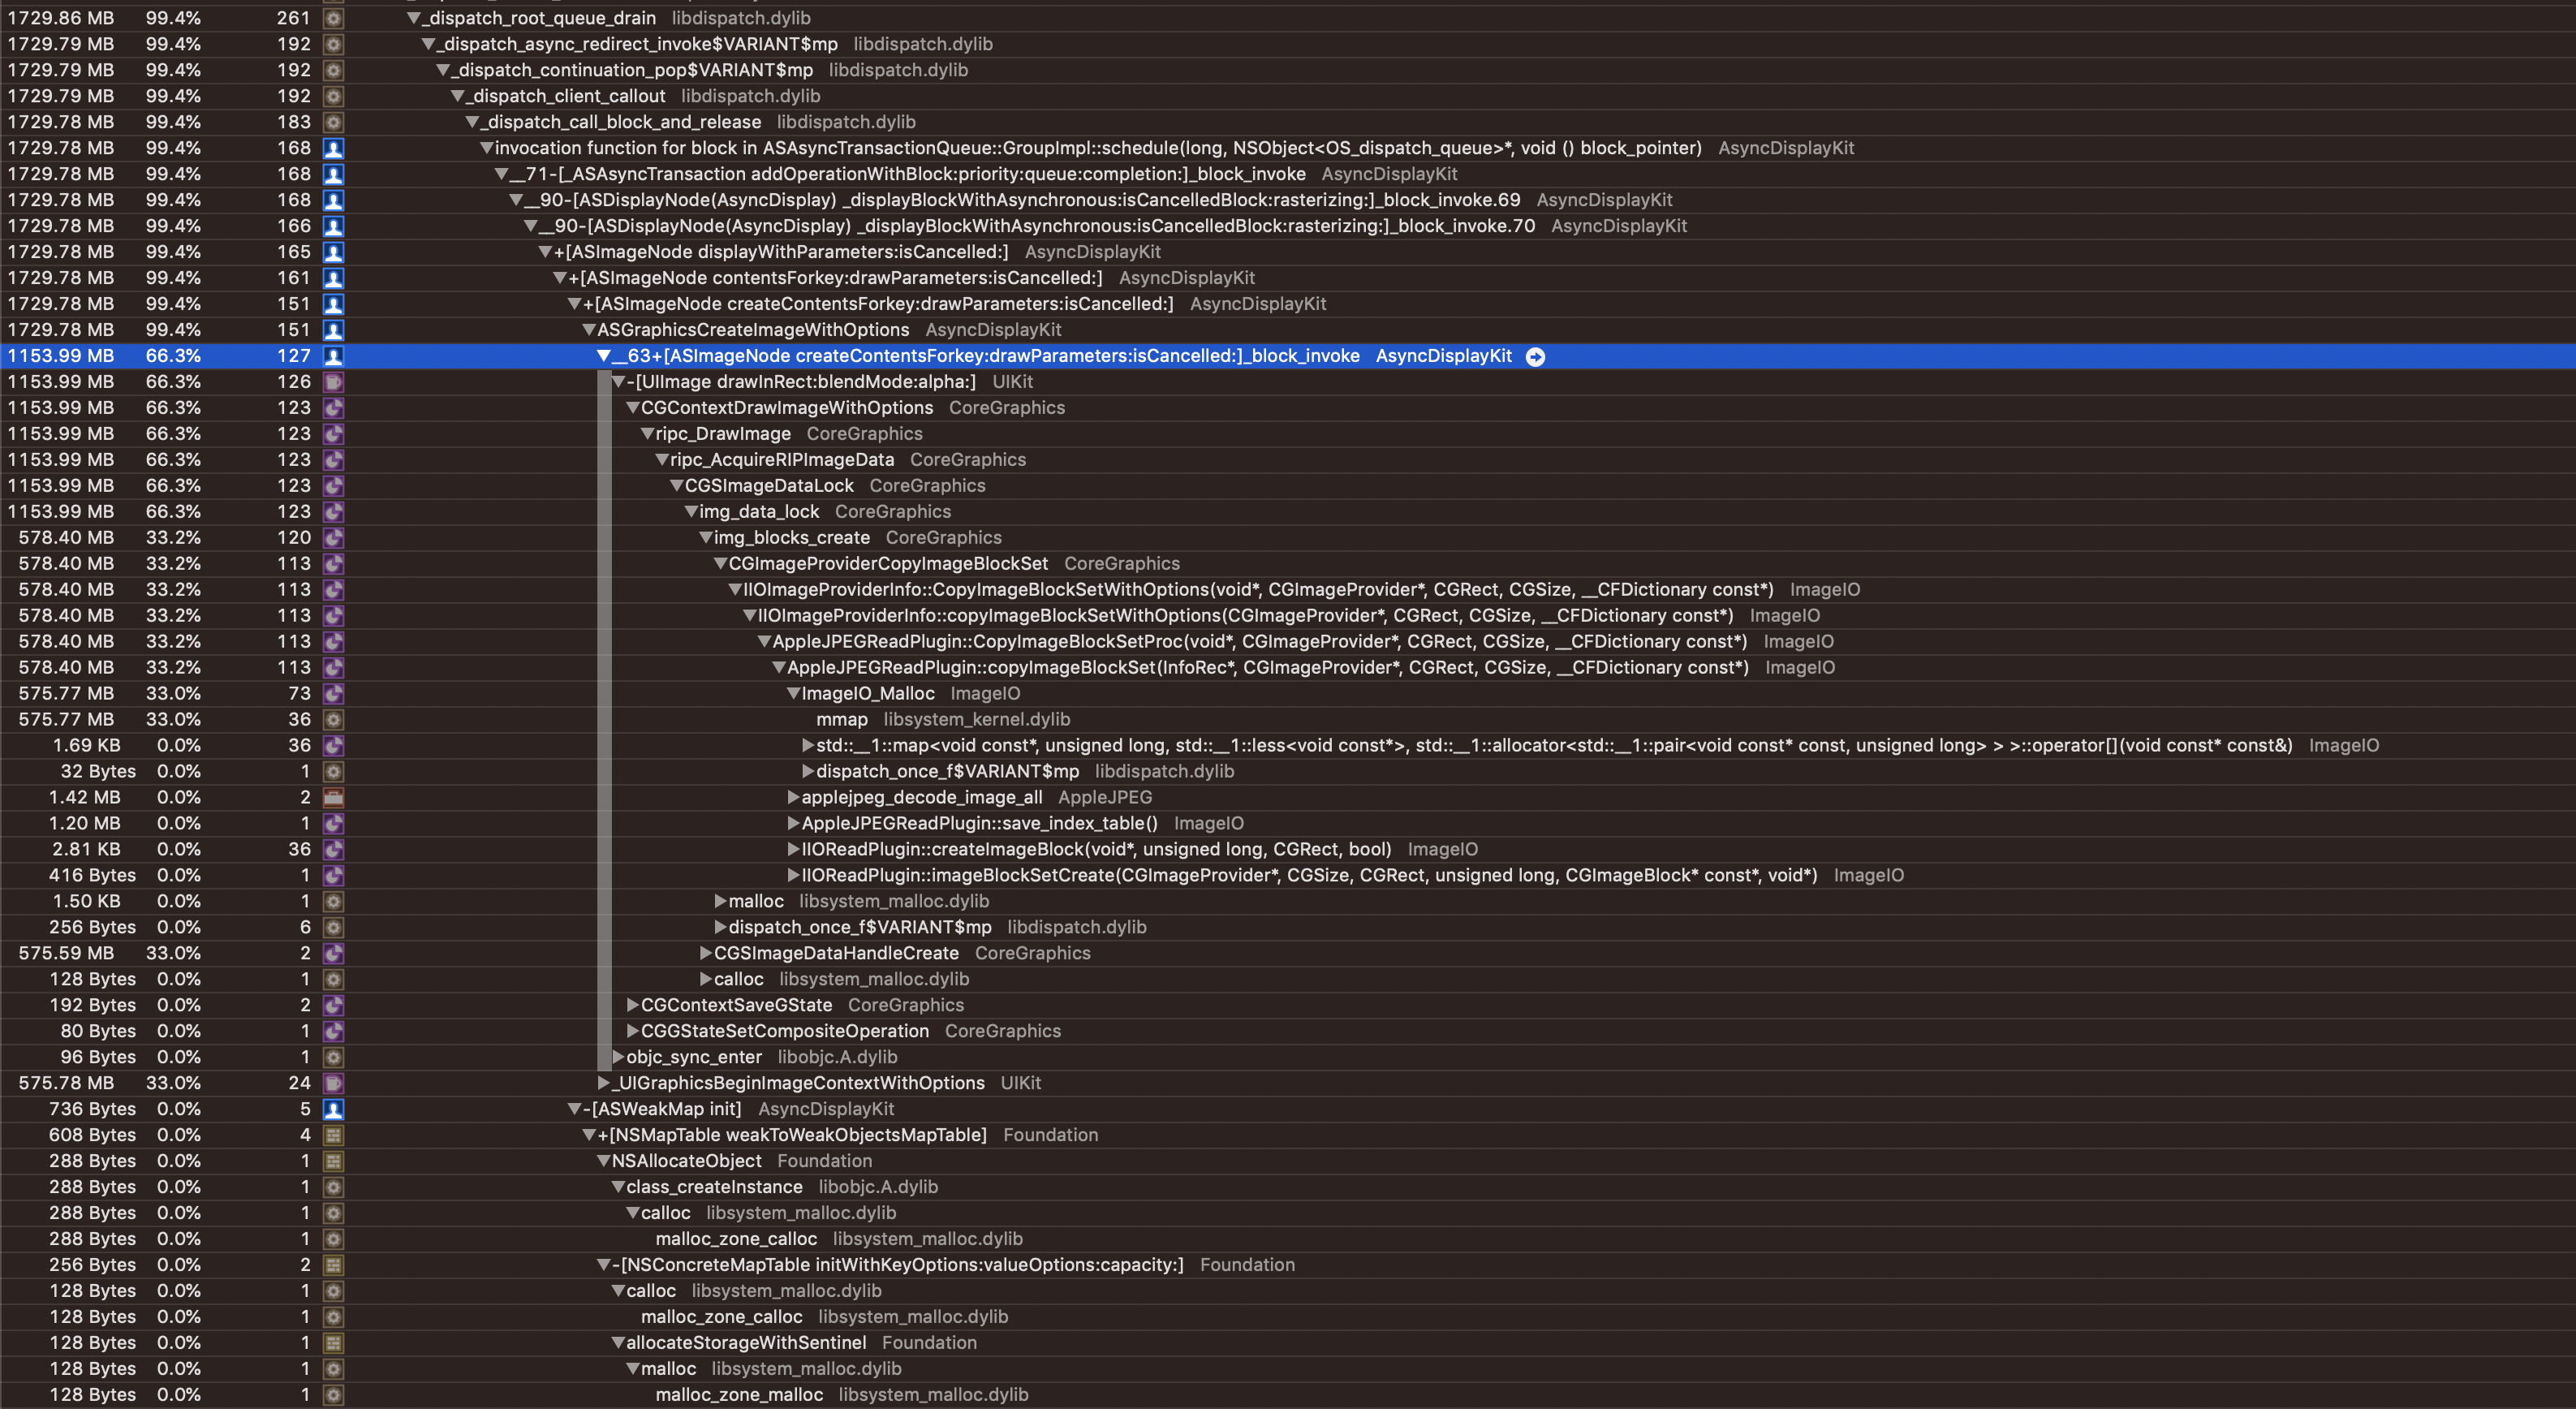 Texture's ASImageNode using 6x more memory to display large